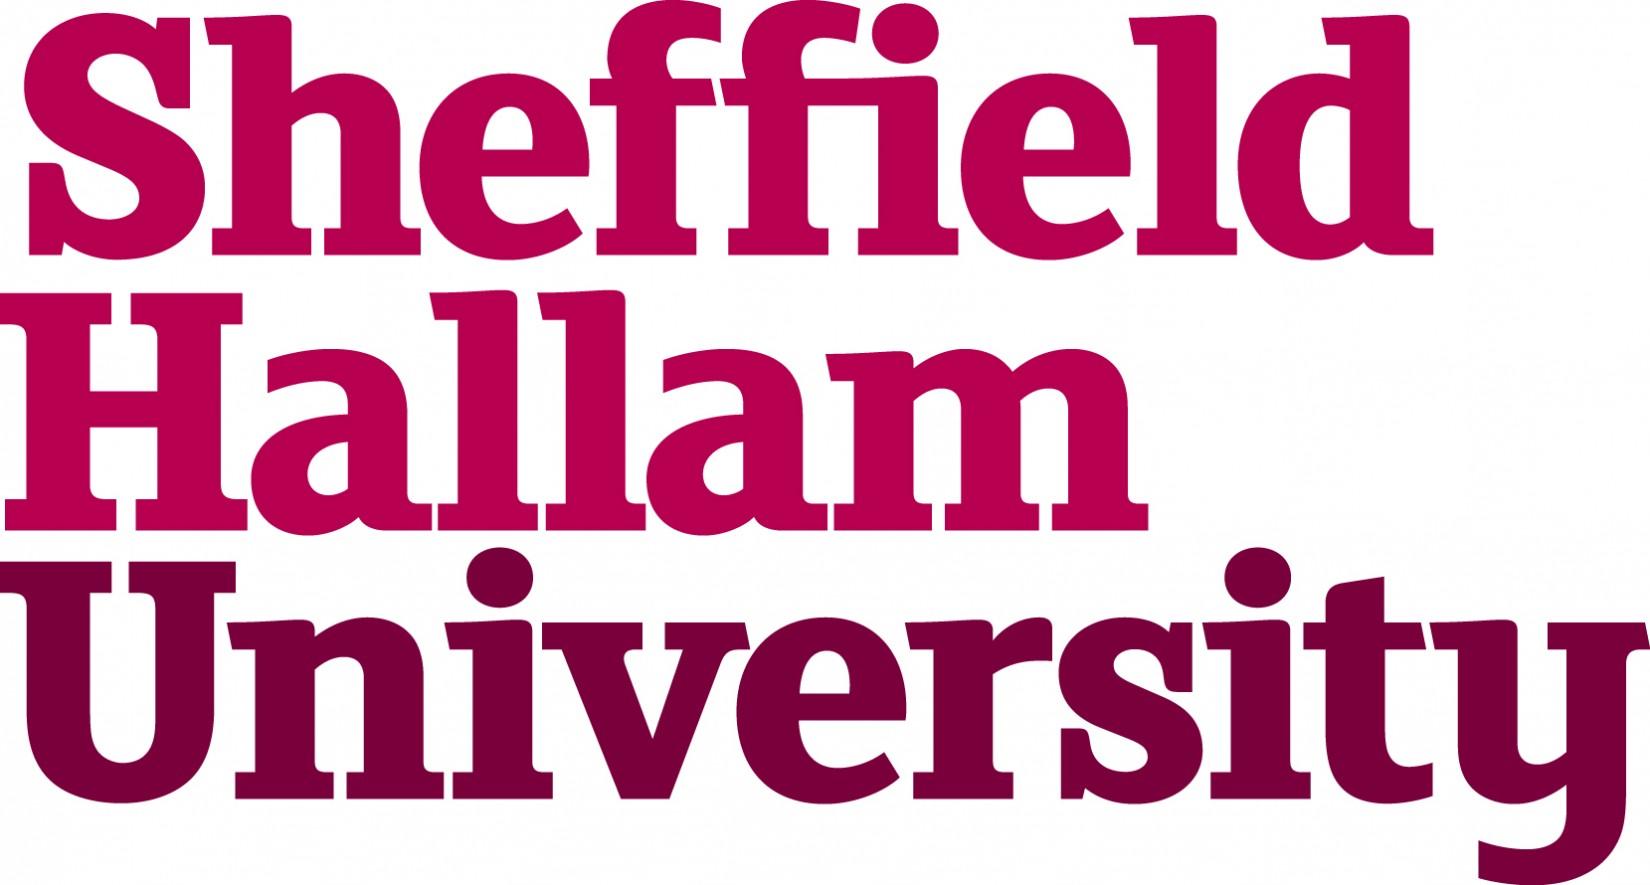 Sheffield Hallam University Logo Font - forum   dafont com